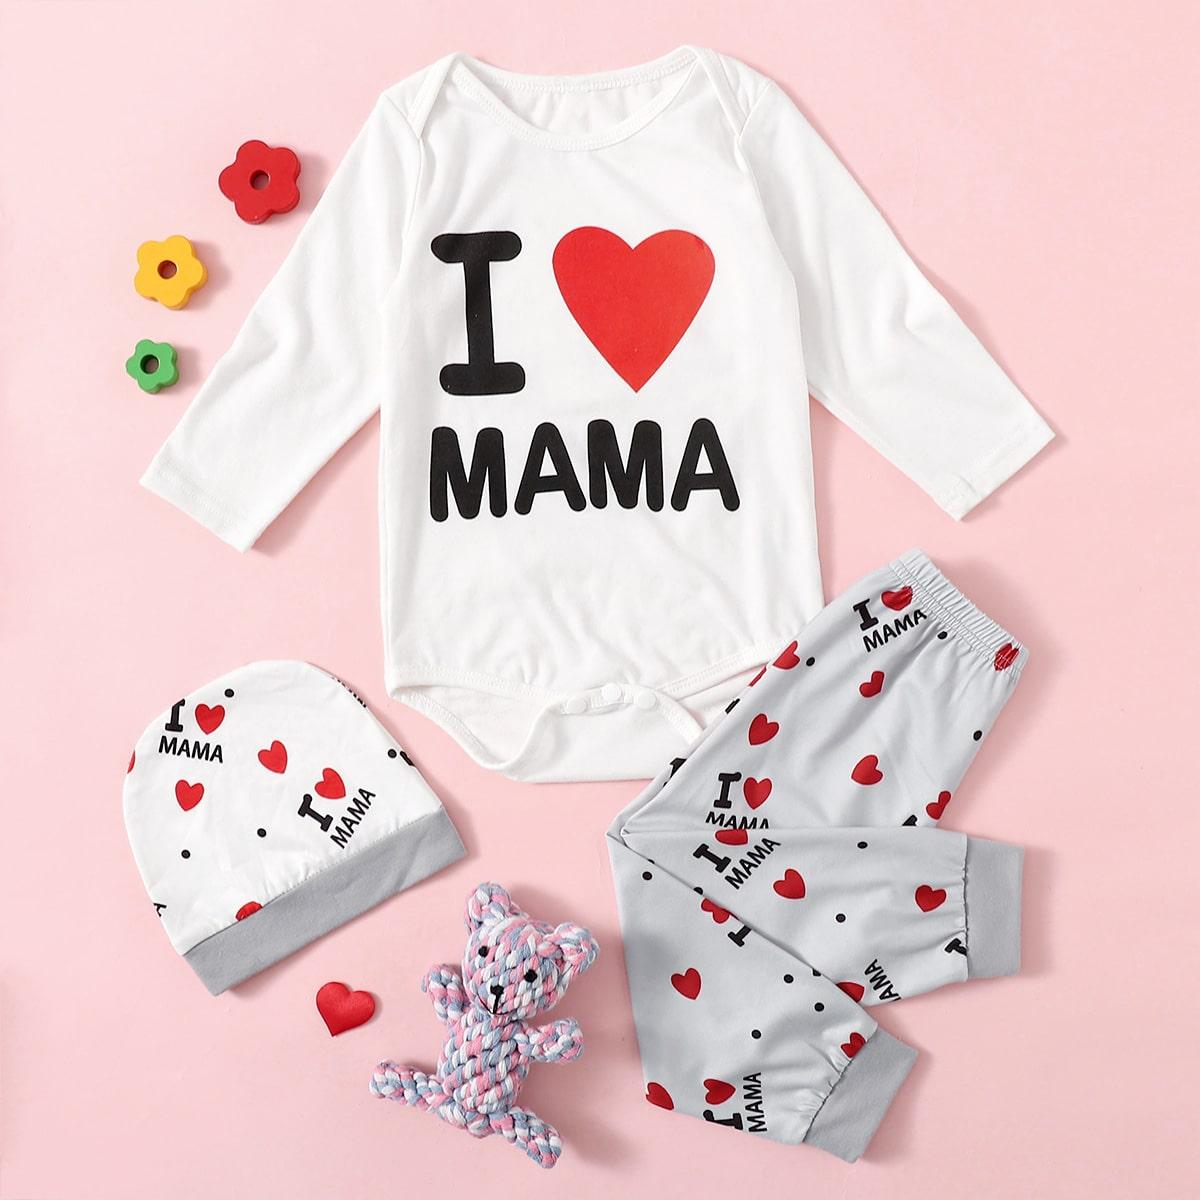 shein Casual Slogan Baby-setjes